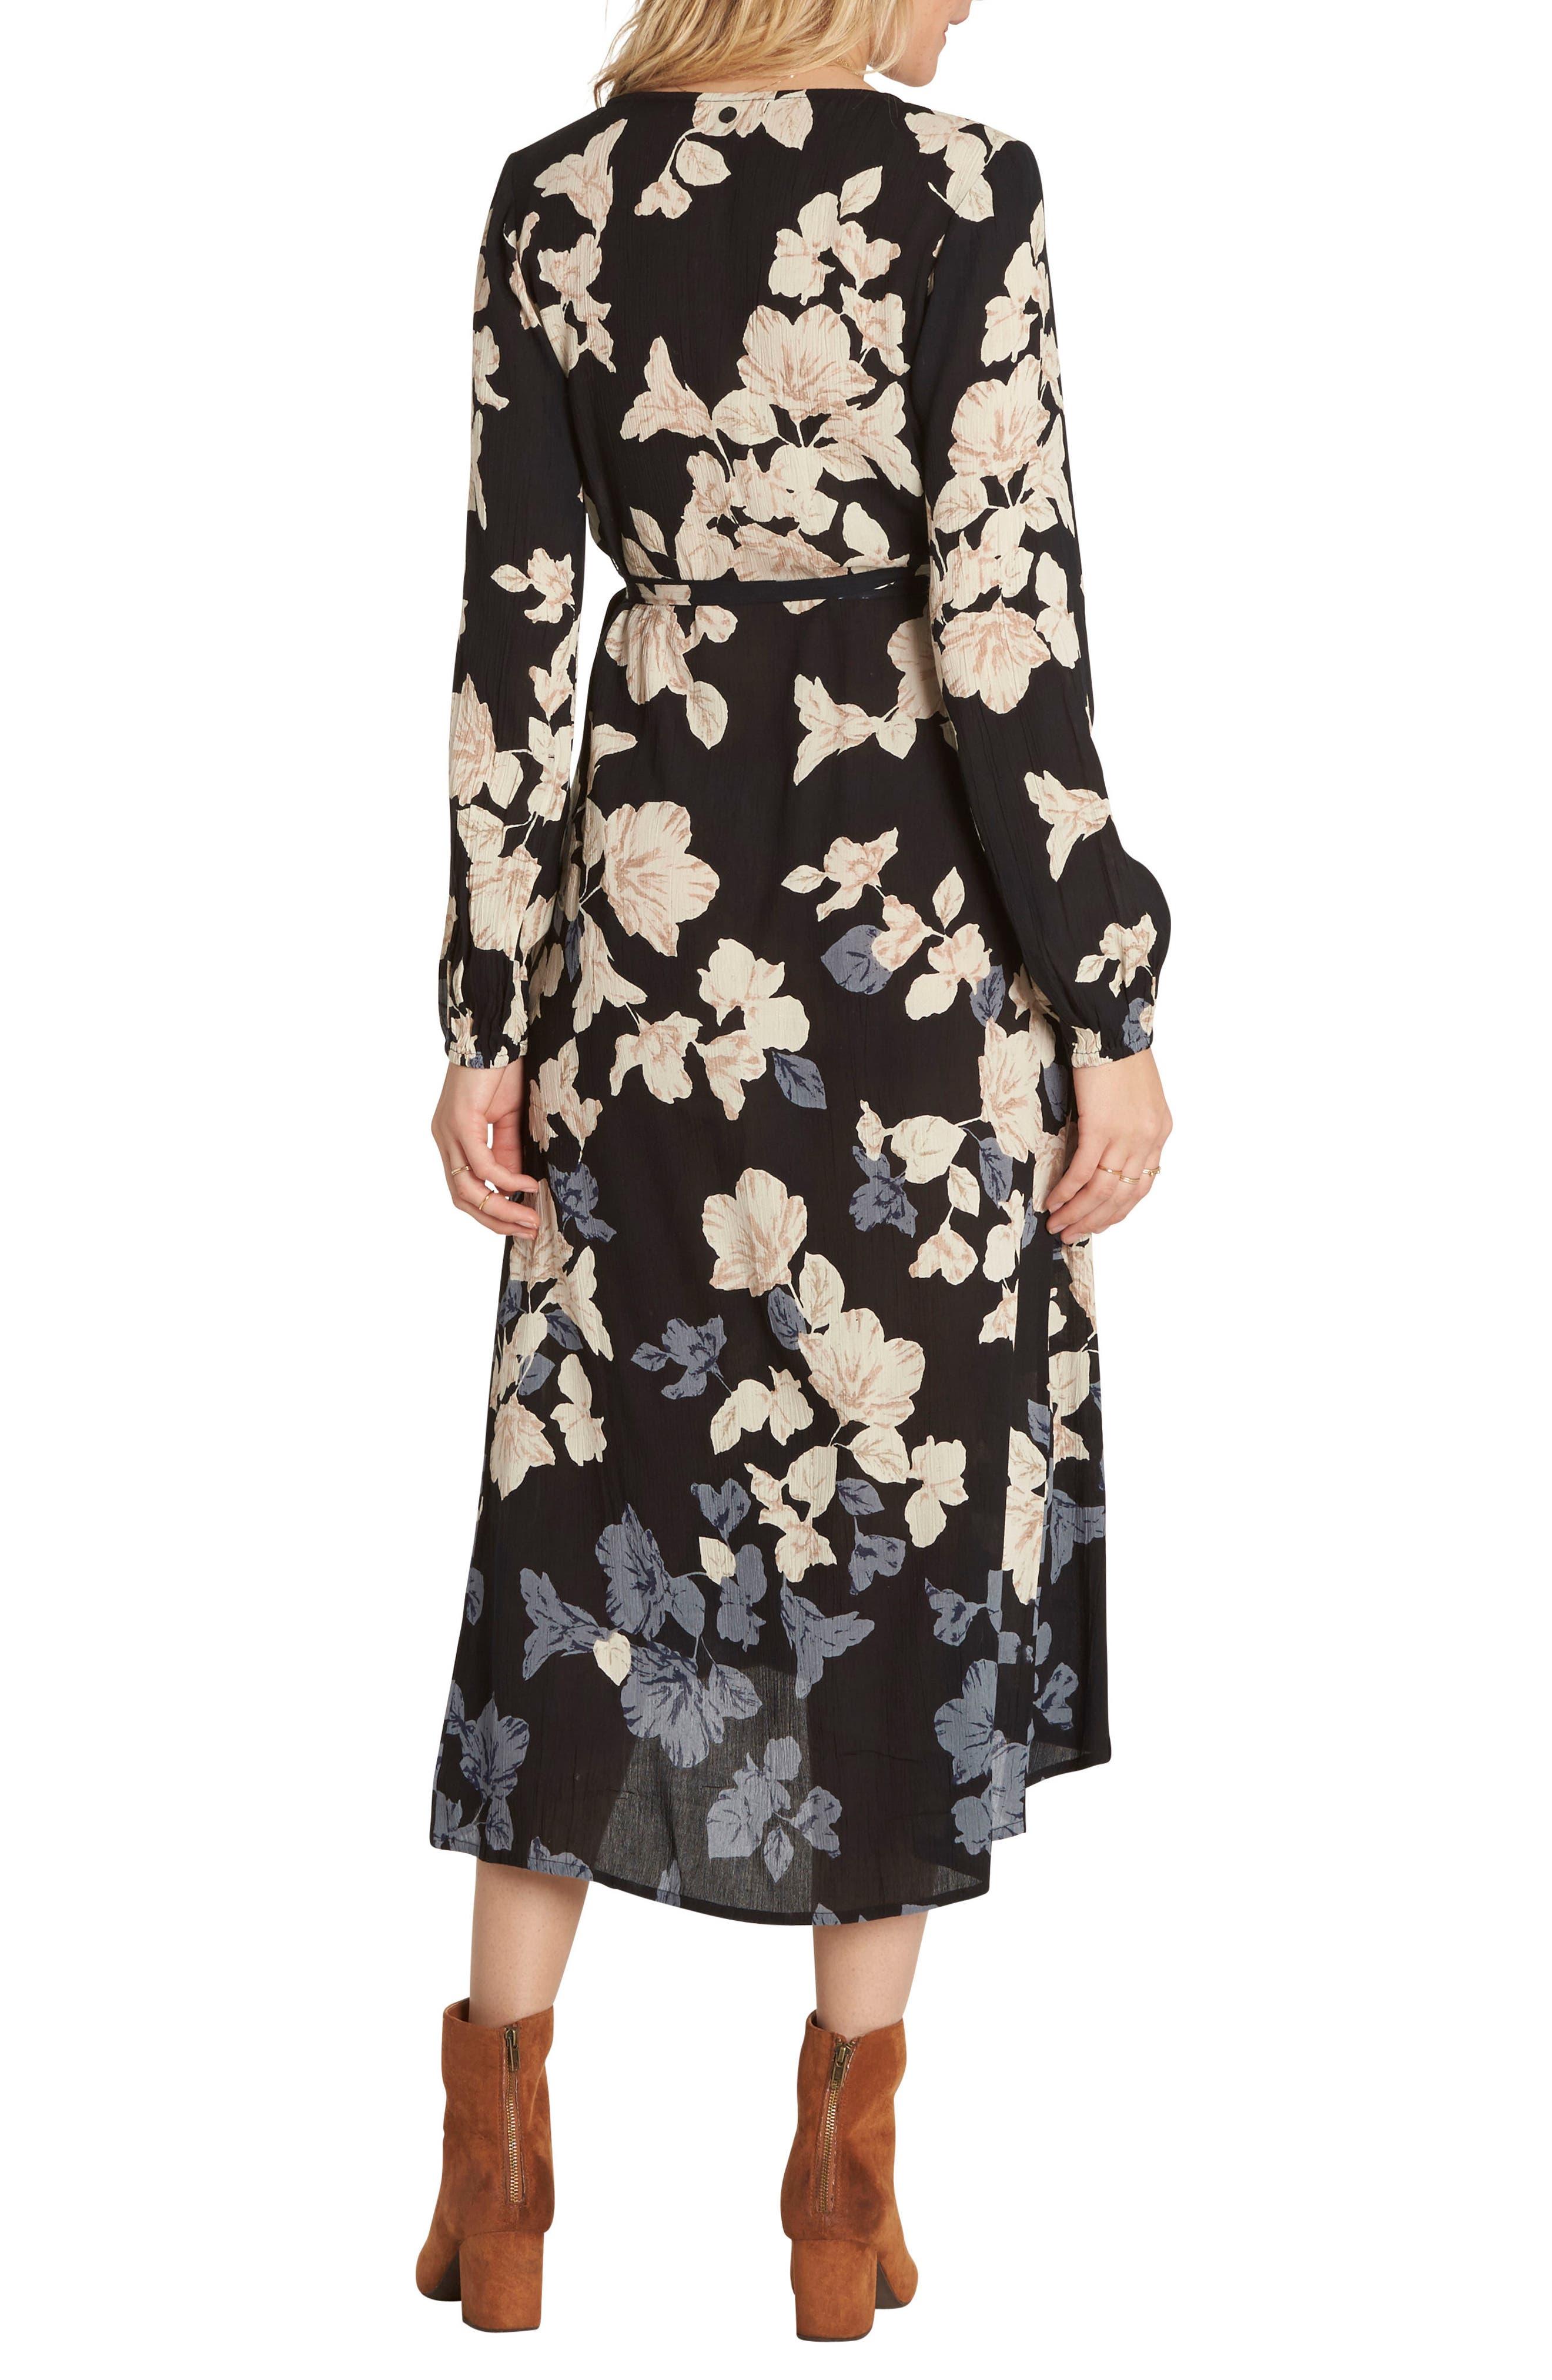 Floral Fever Midi Dress,                             Alternate thumbnail 2, color,                             001